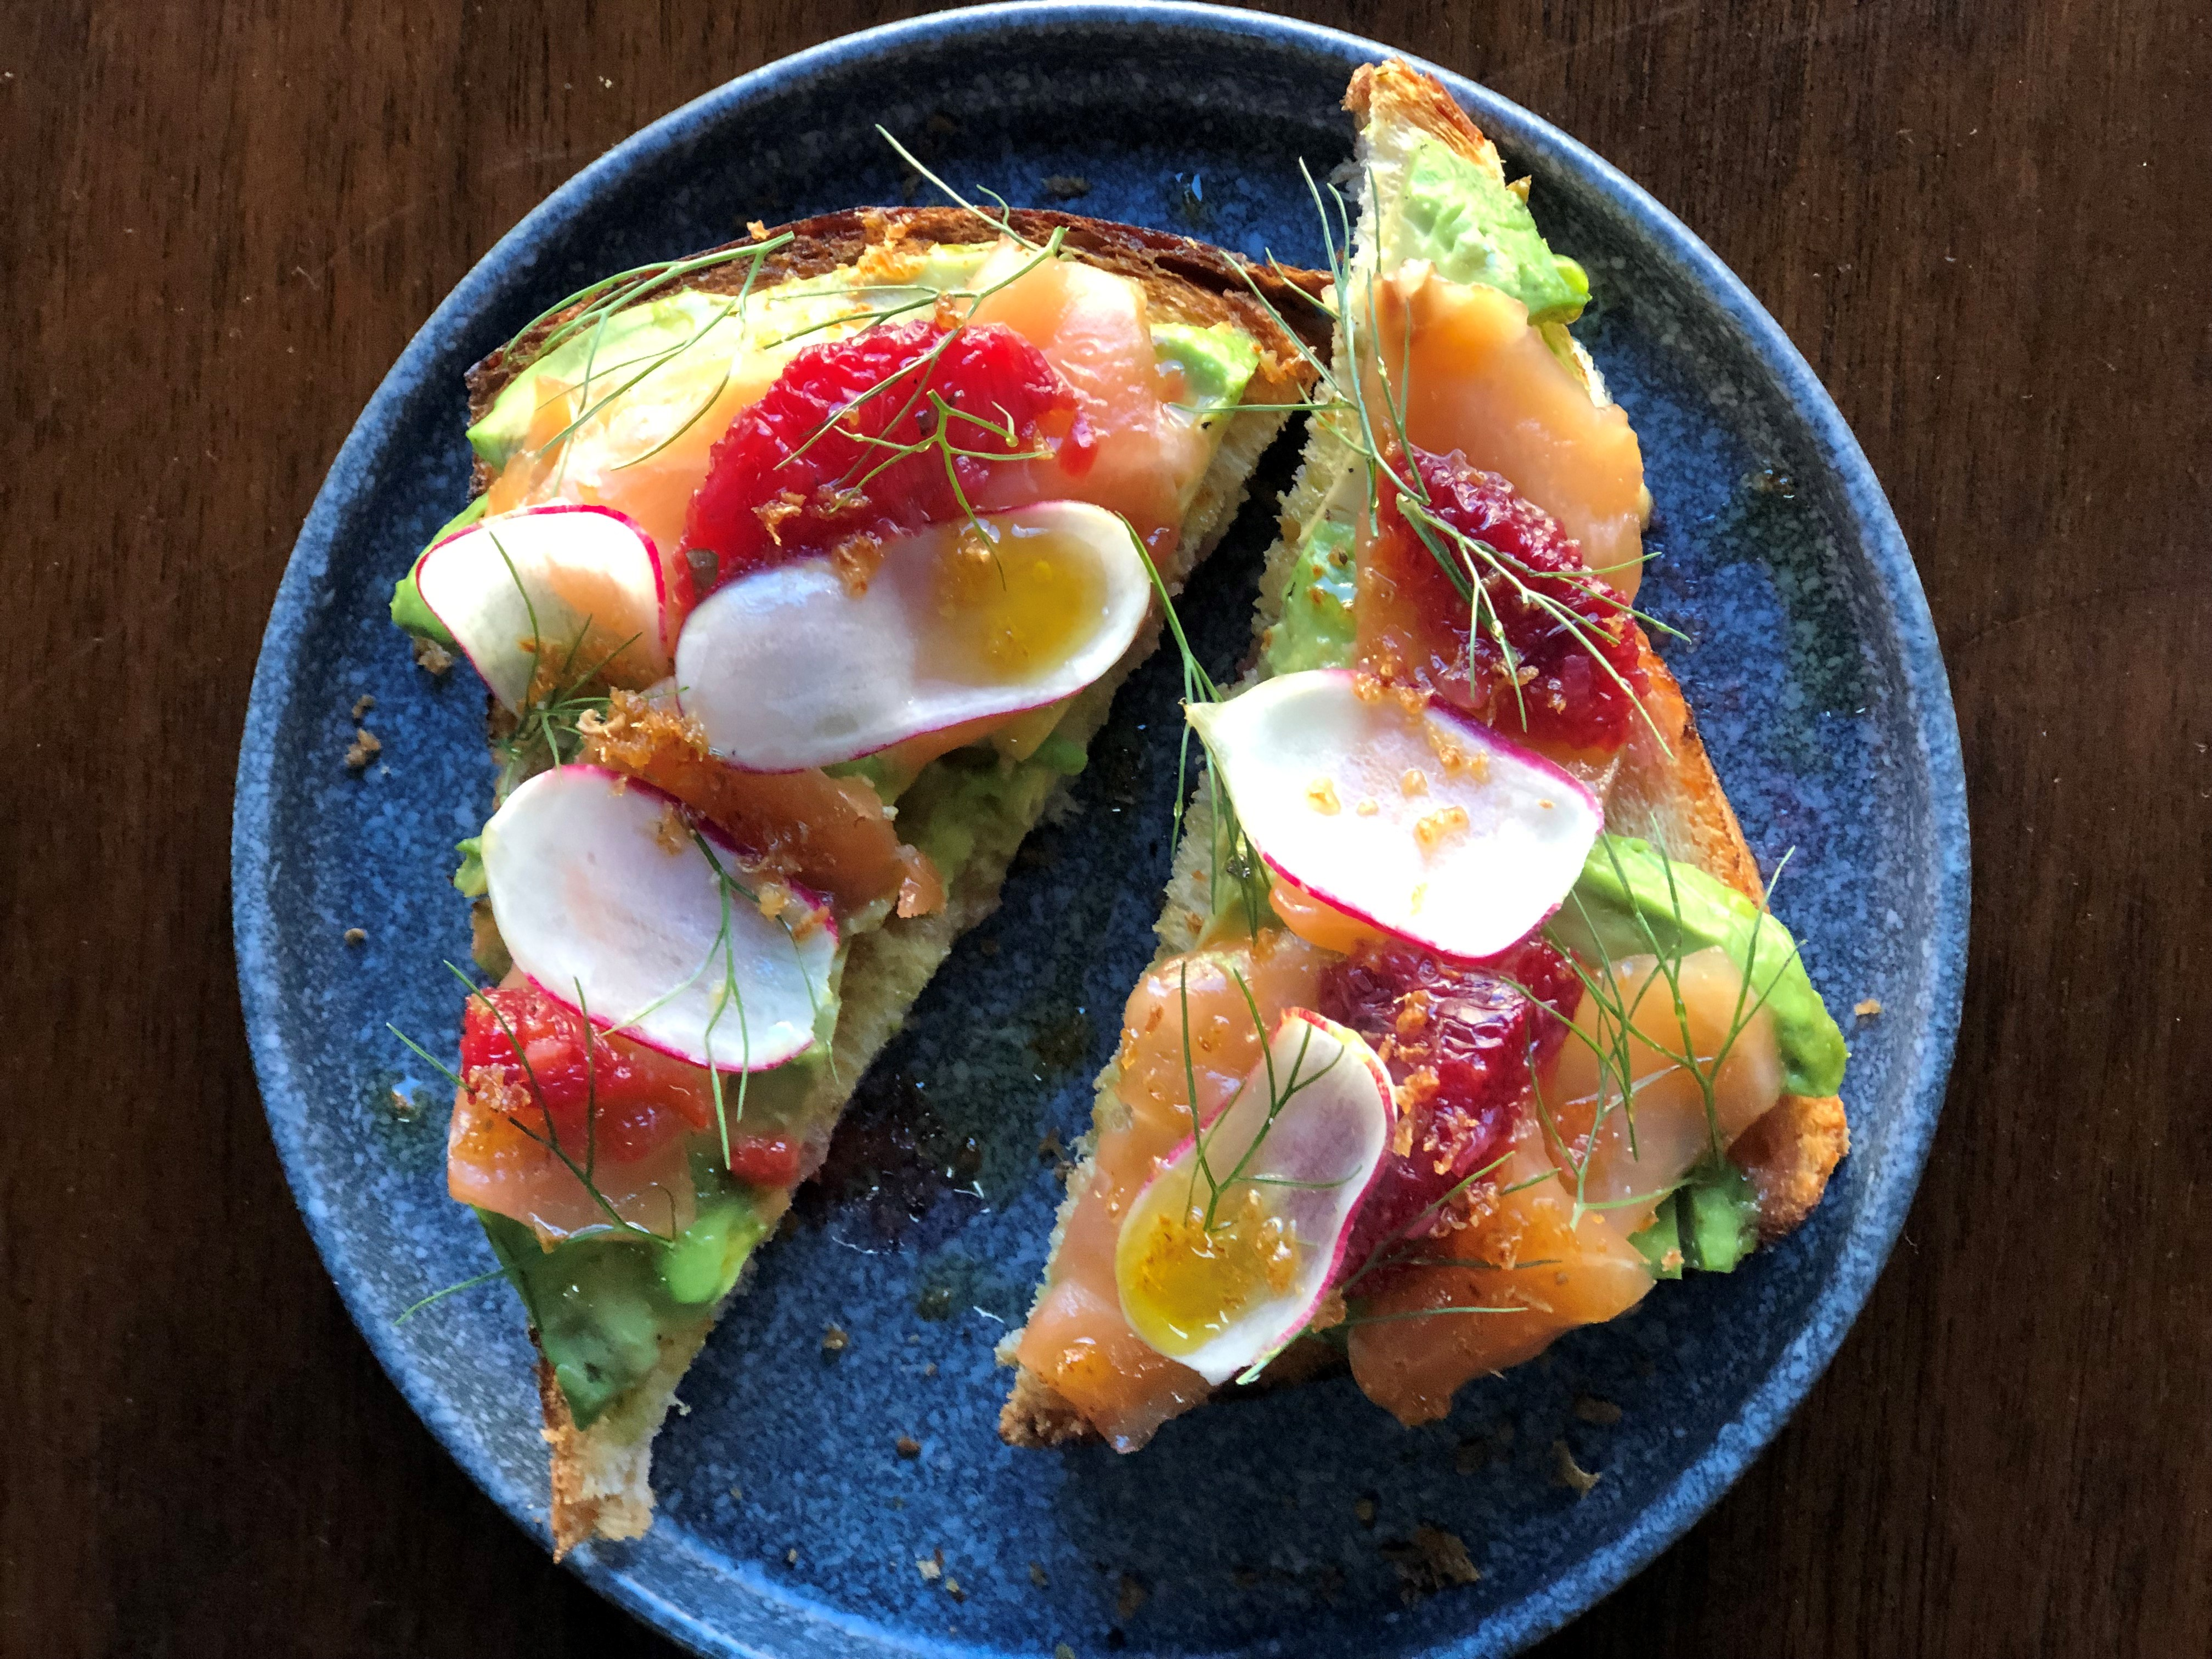 Café Beatrice's avocado toast with cured salmon, blood orange, and radish